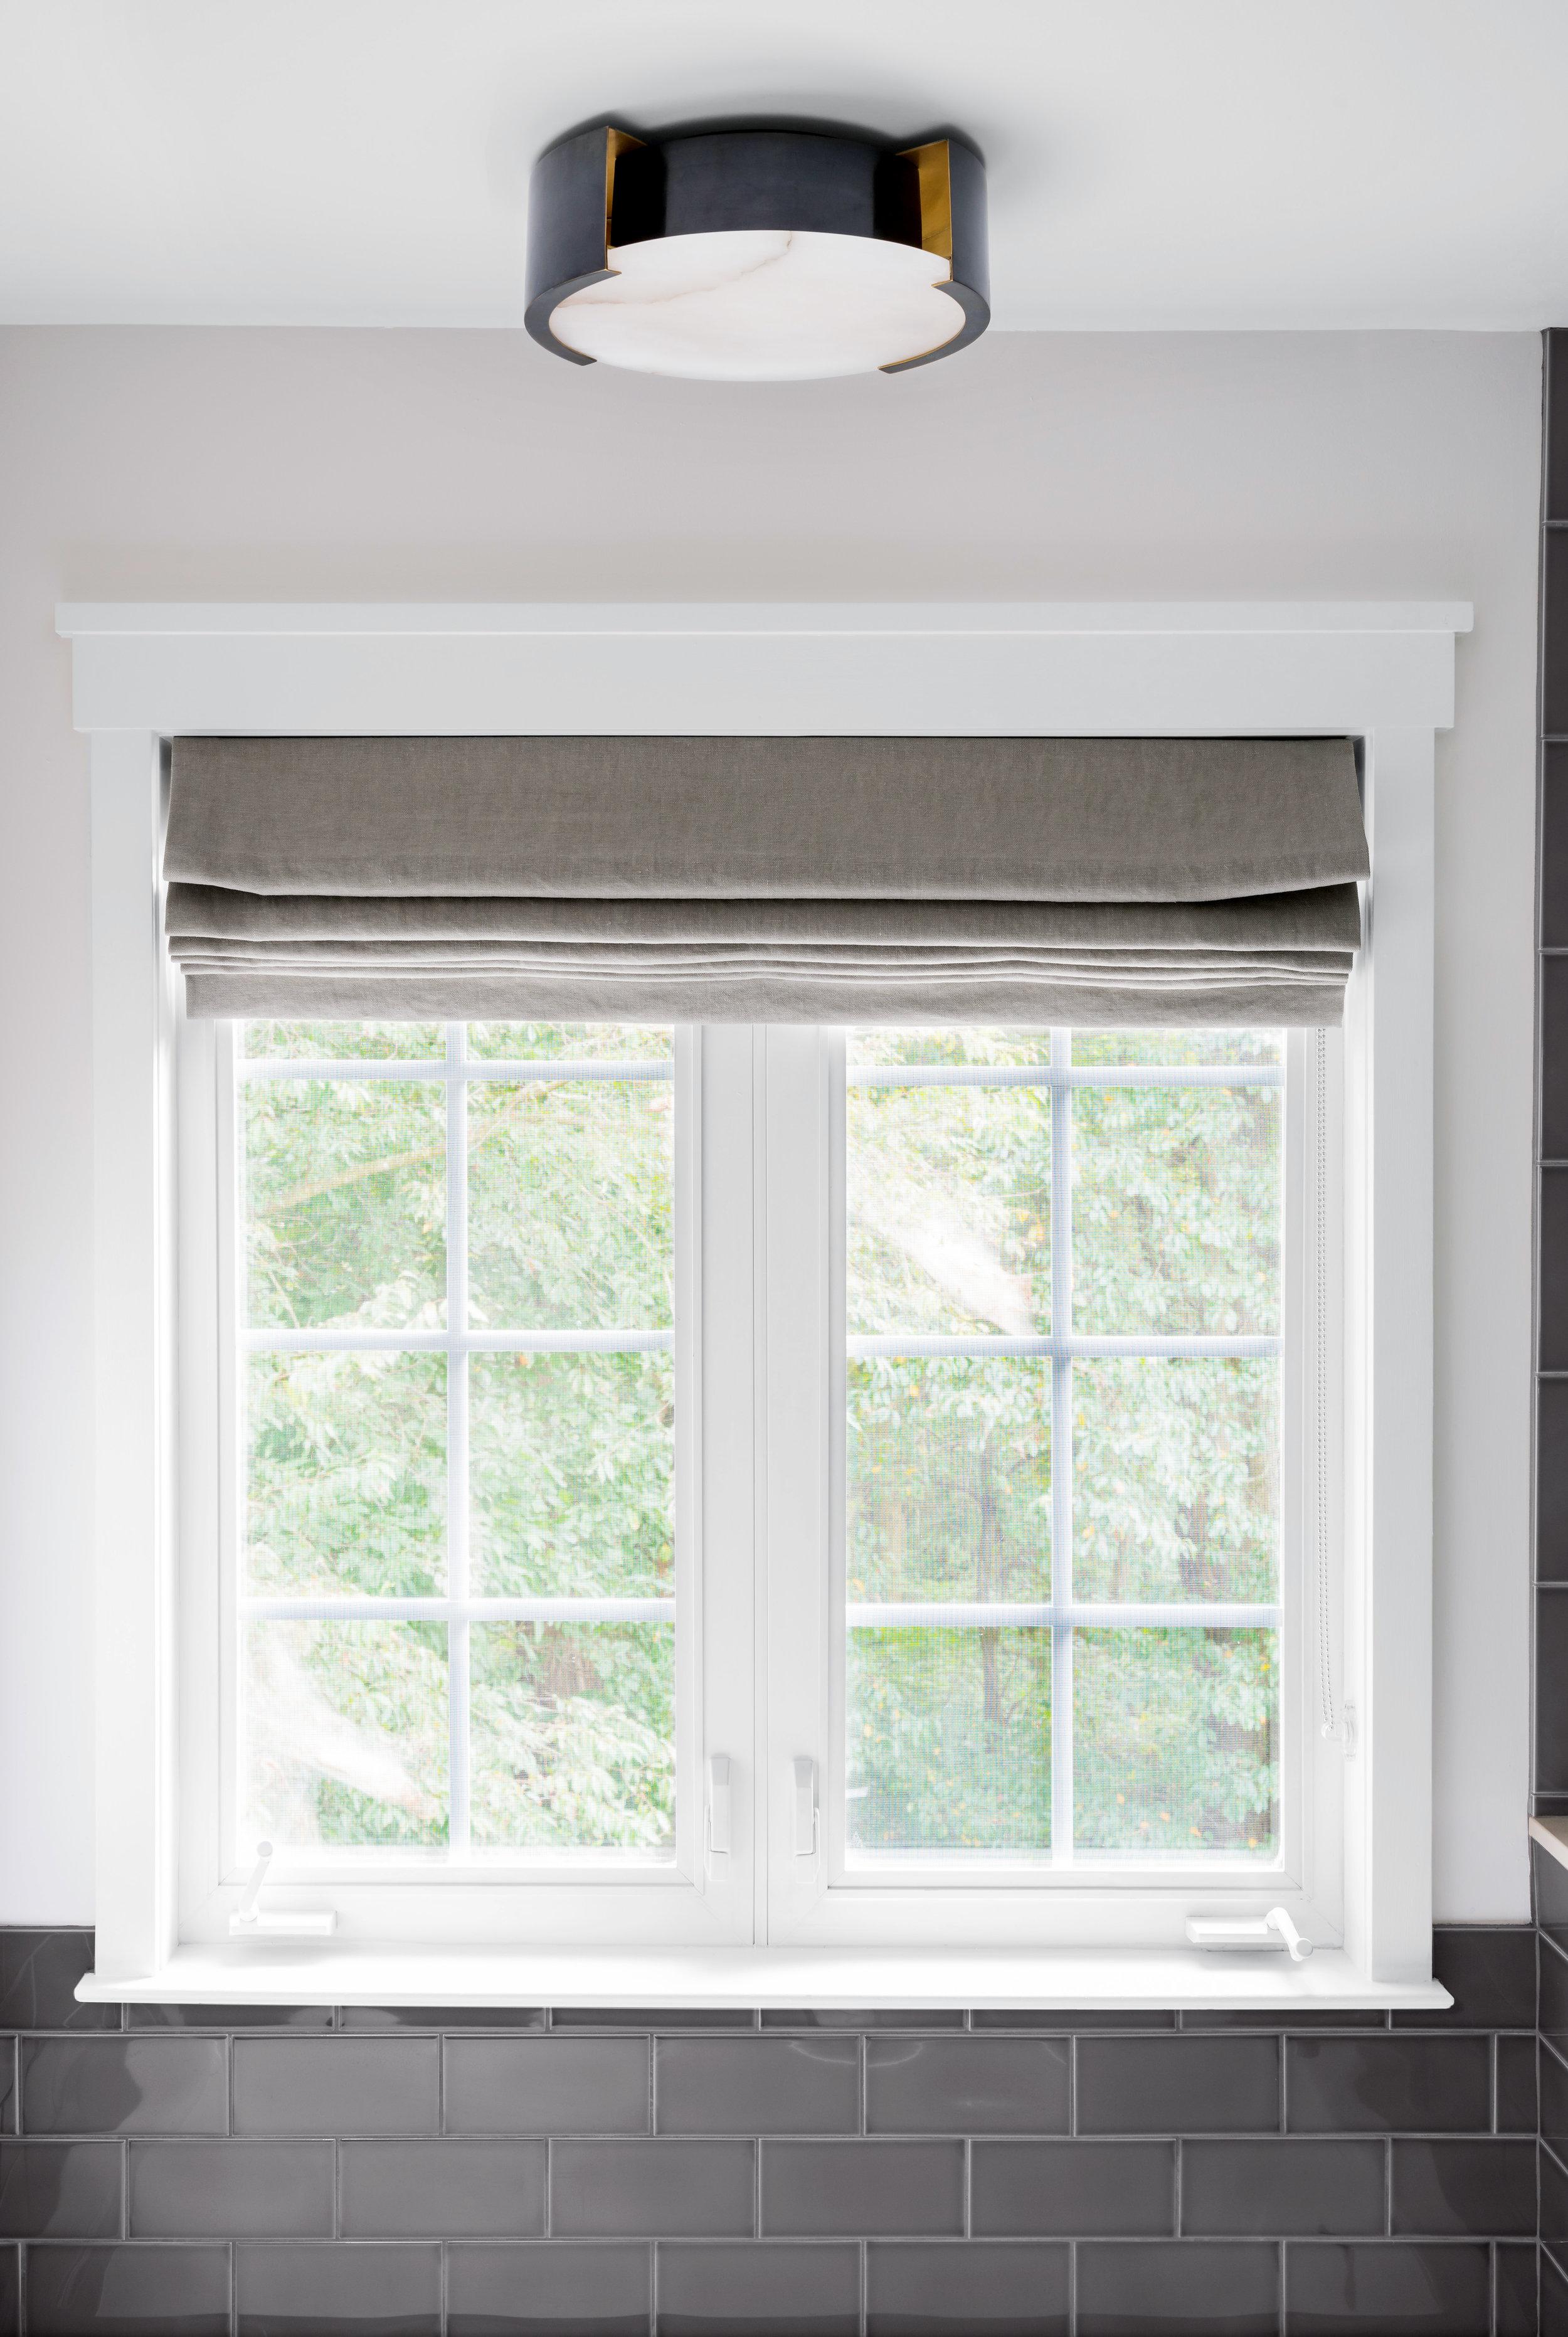 AFTER: Modern flushmount light, updated window millwork and custom roman shade.